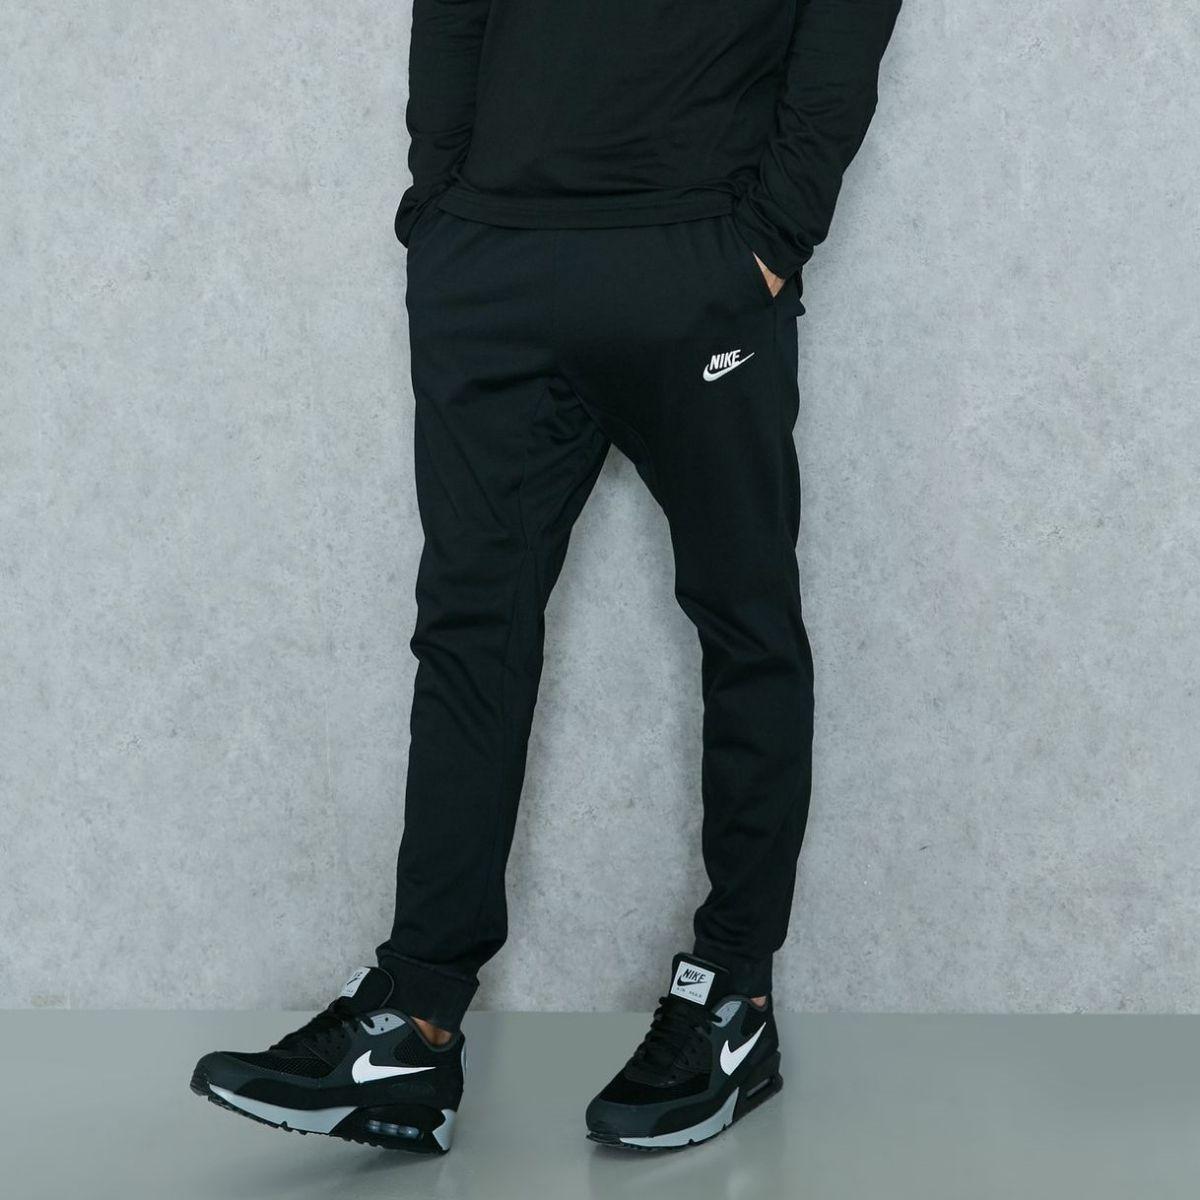 Pantalone Nike Jogger...